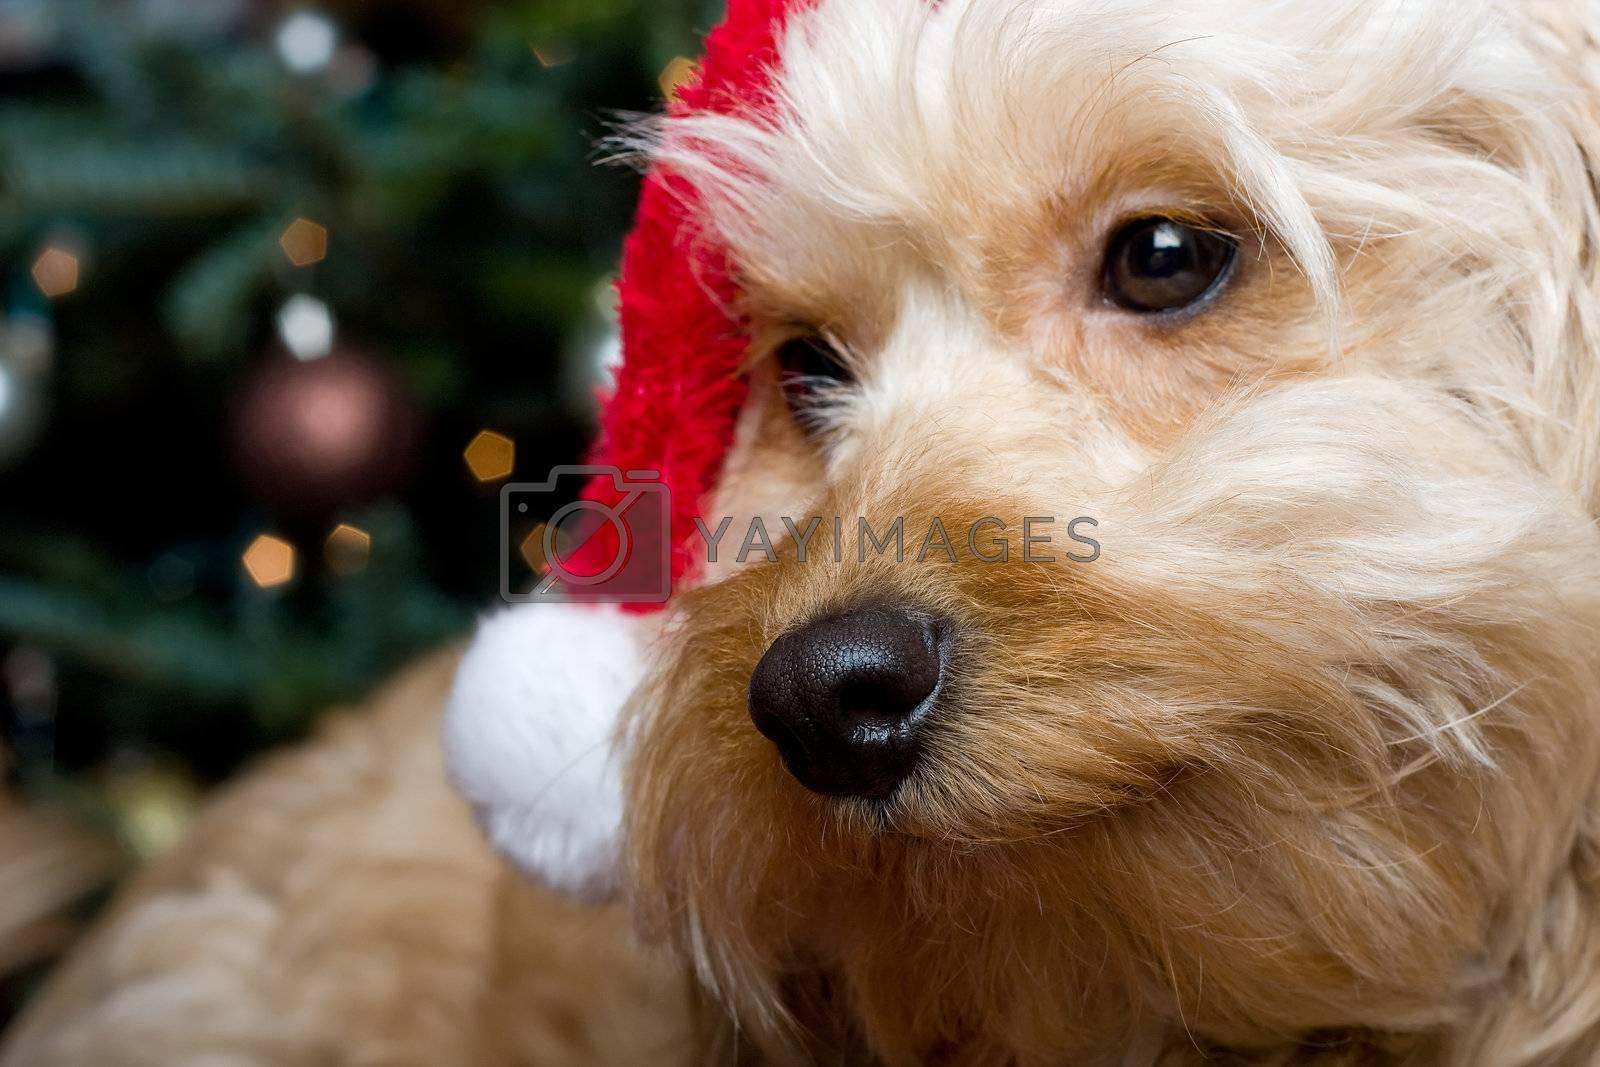 Royalty free image of santa puppy by snokid